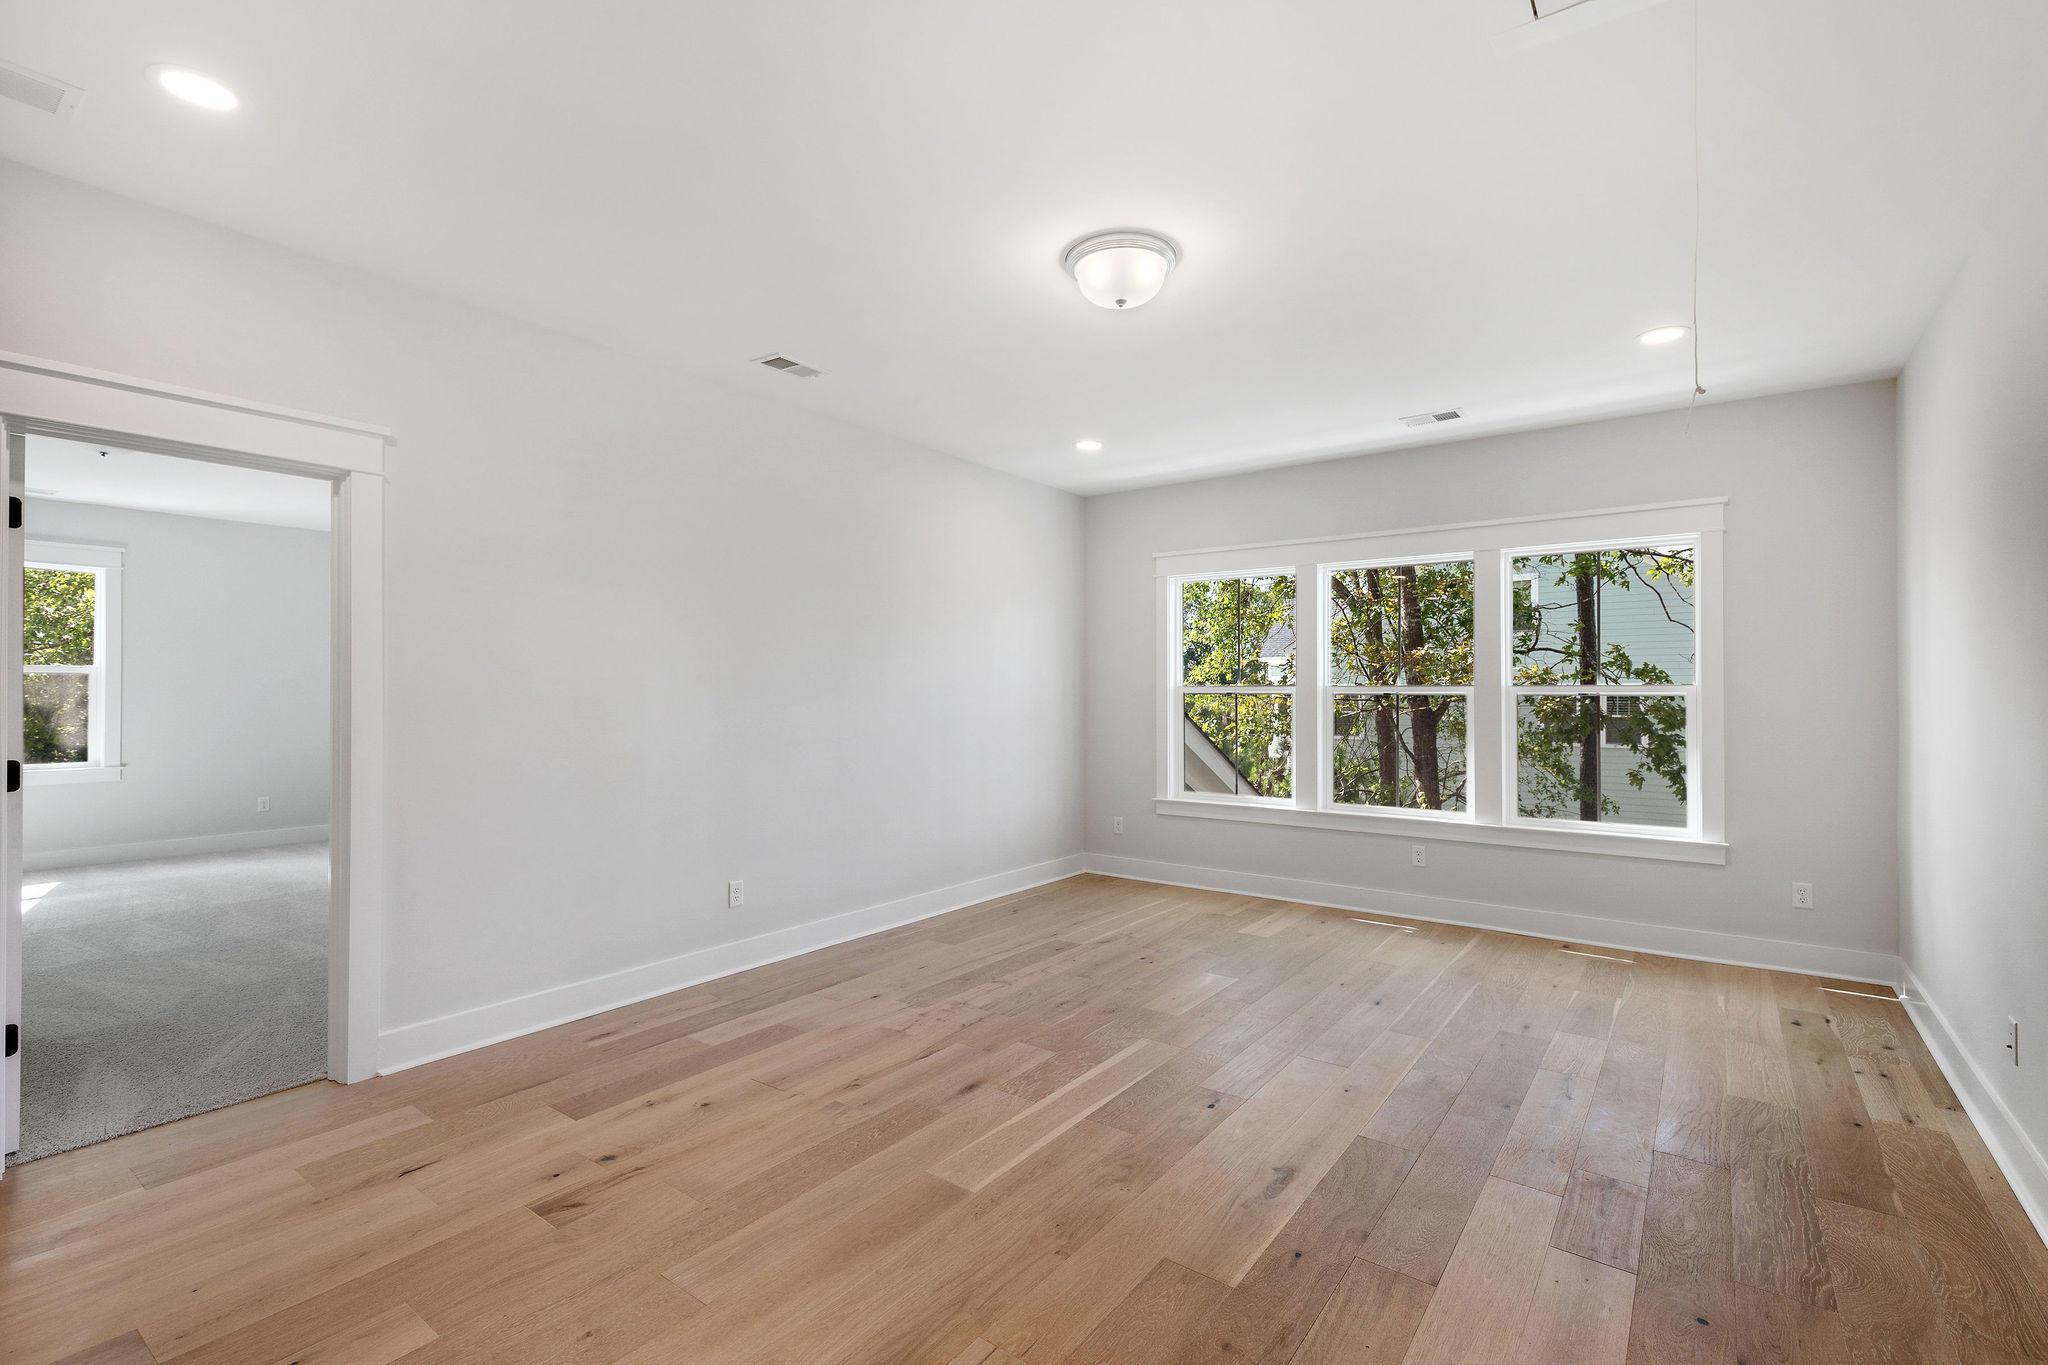 Park West Homes For Sale - 2291 Middlesex, Mount Pleasant, SC - 18